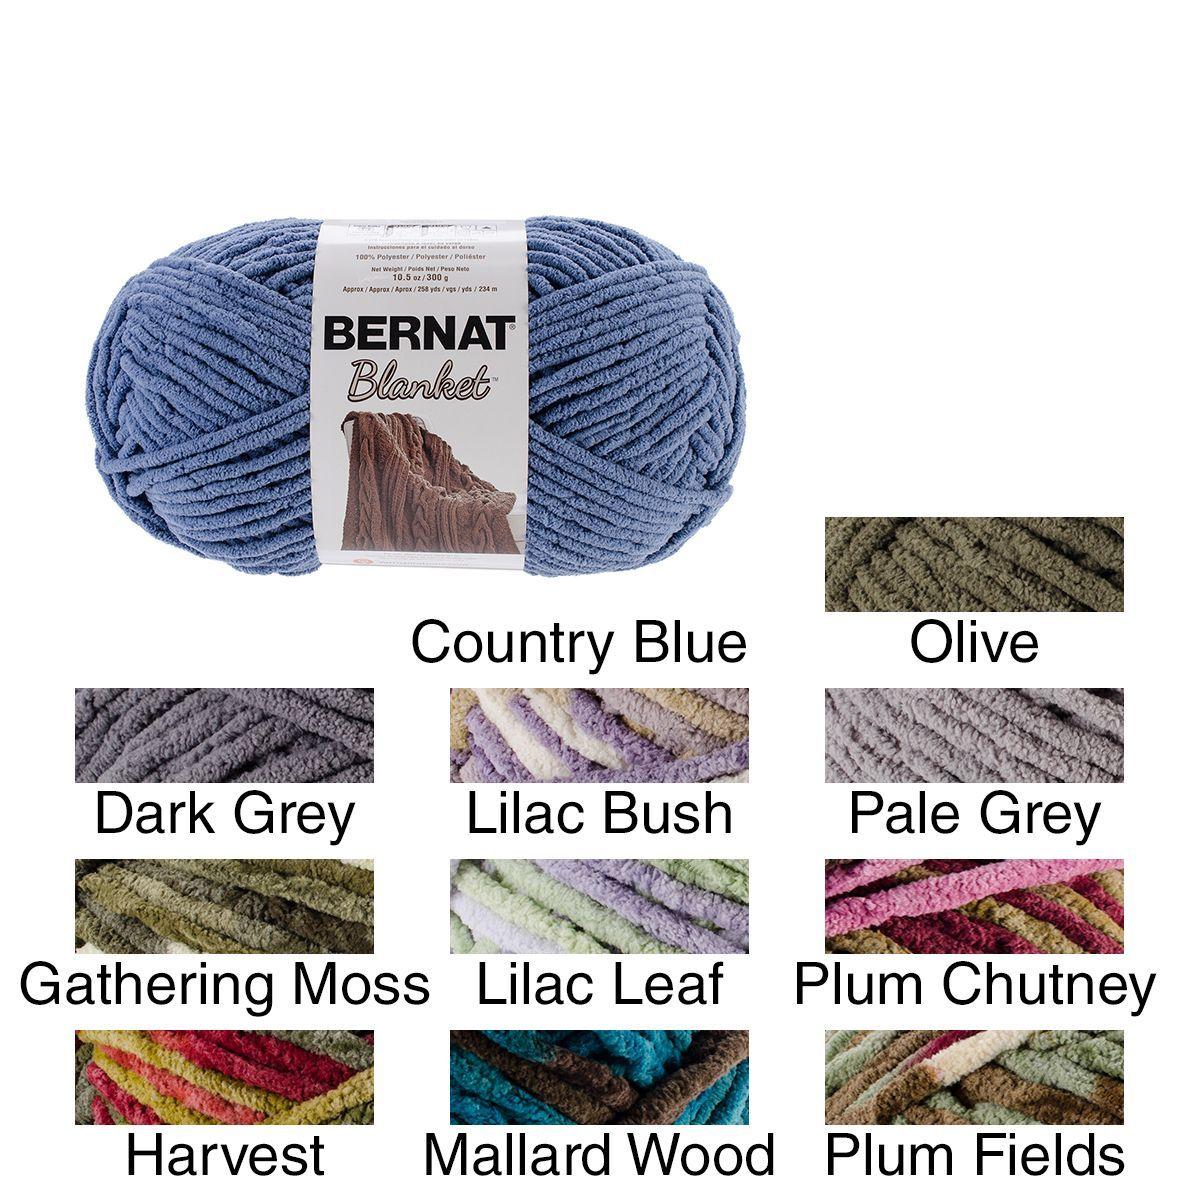 Bernat Blanket Big Ball Yarn (Country Blue) | Crochet. | Pinterest